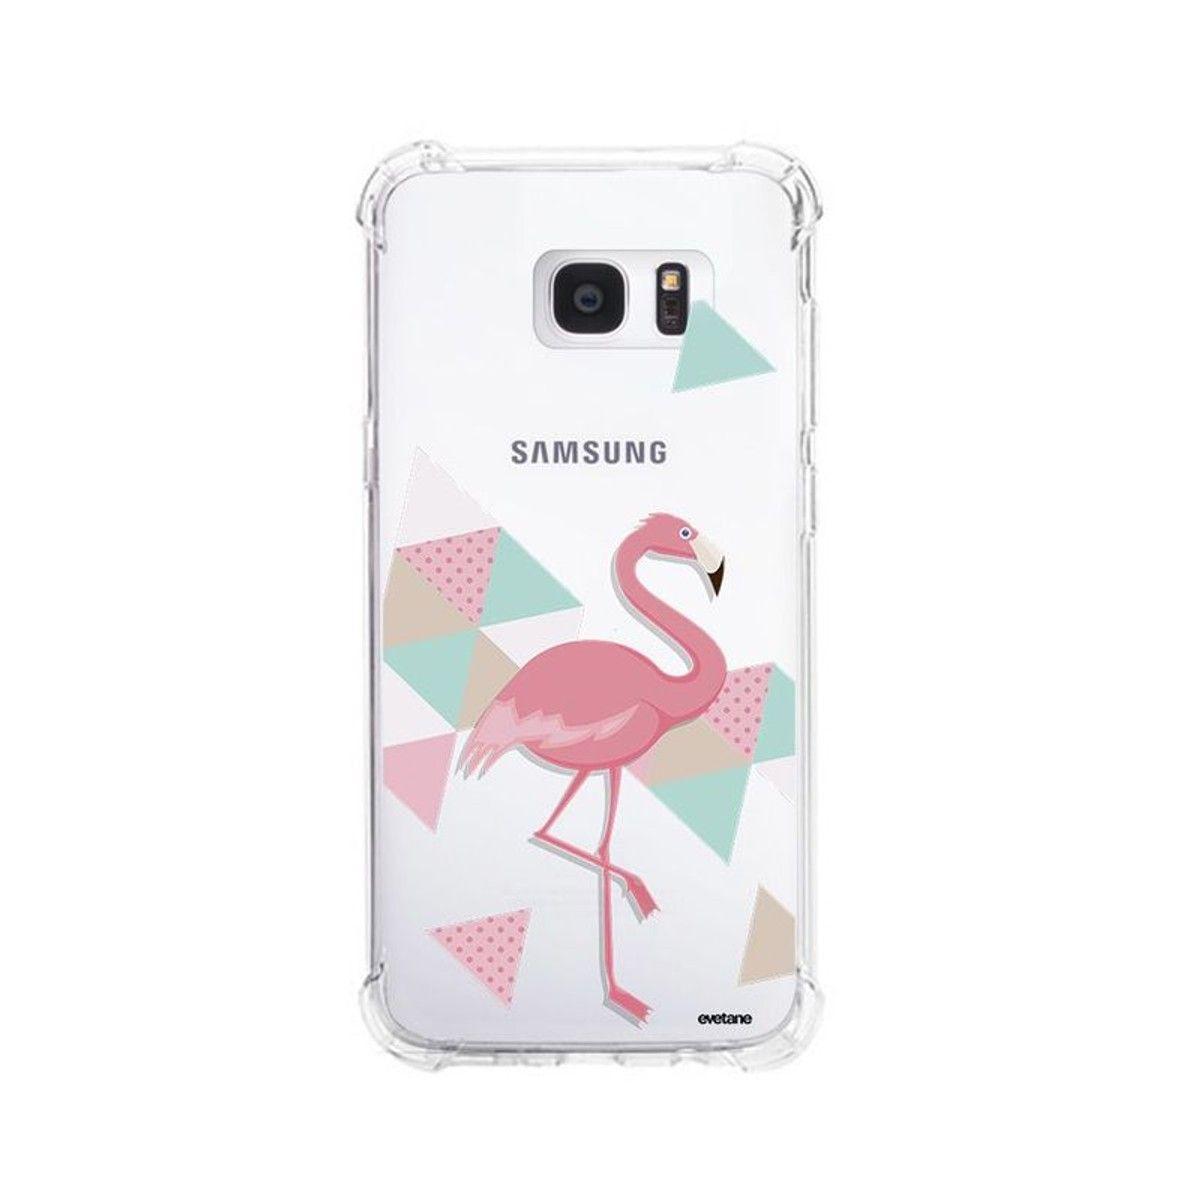 Coque Samsung Galaxy S7 Edge anti-choc souple avec angles ...